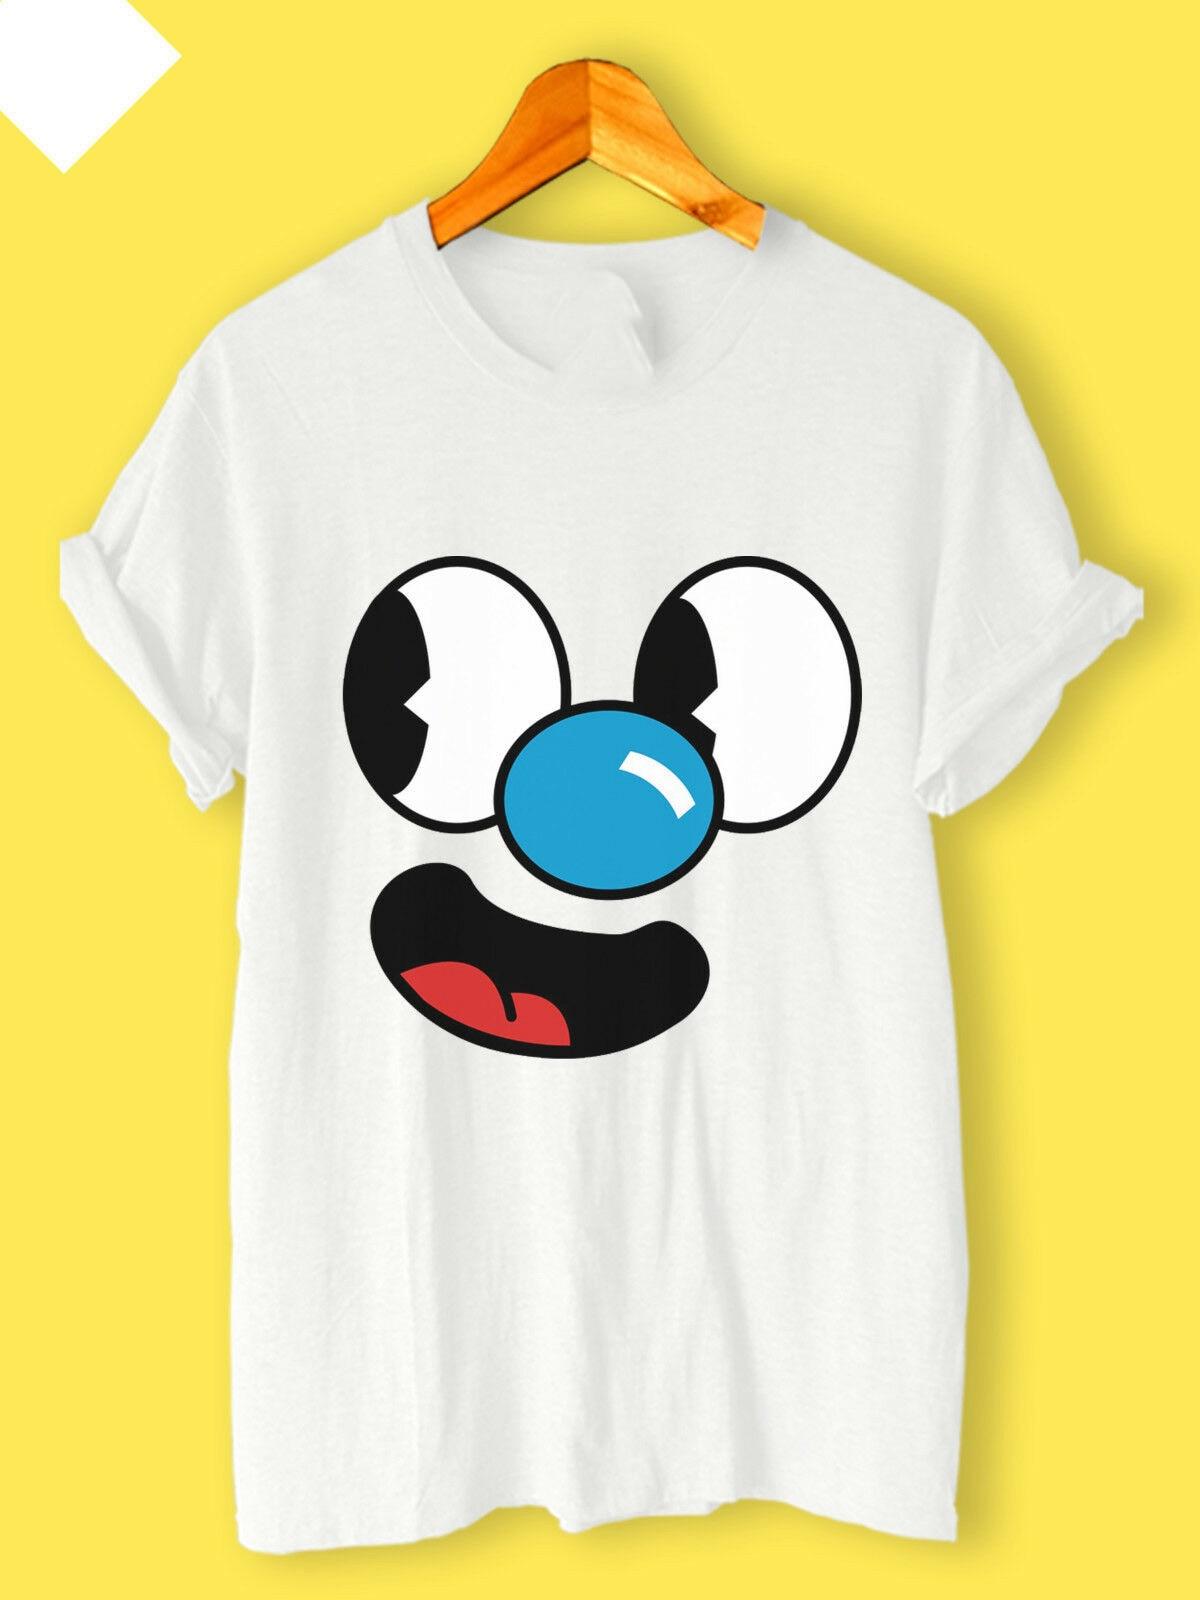 2020 novo cuphead mugman logo jogo dos desenhos animados novo casual usar unisex camiseta s, m, l, xl, 2xl, 3xl streetwear